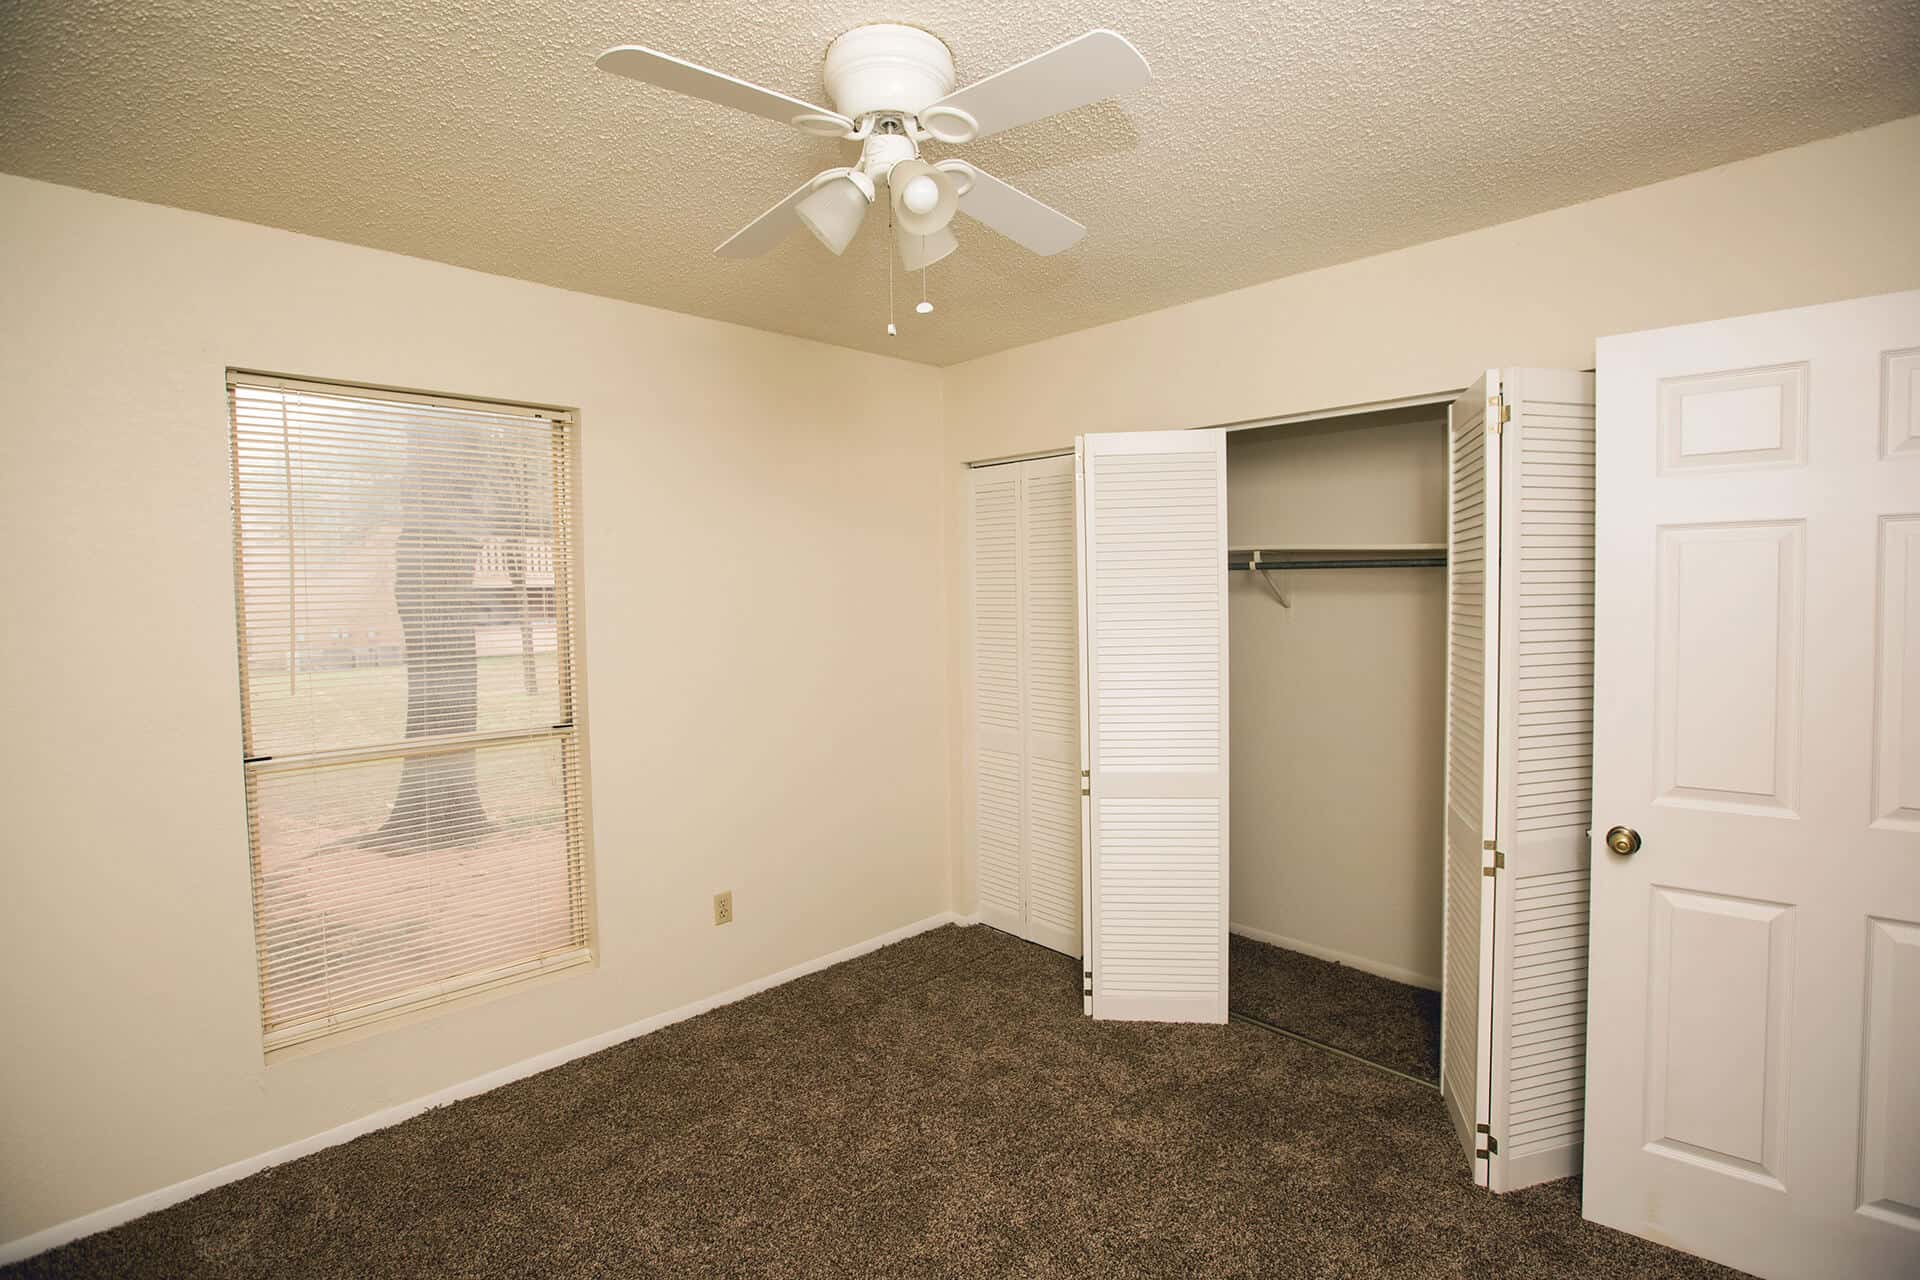 Lubbock Pet-Friendly Apartments for Rent - Omni Apartments